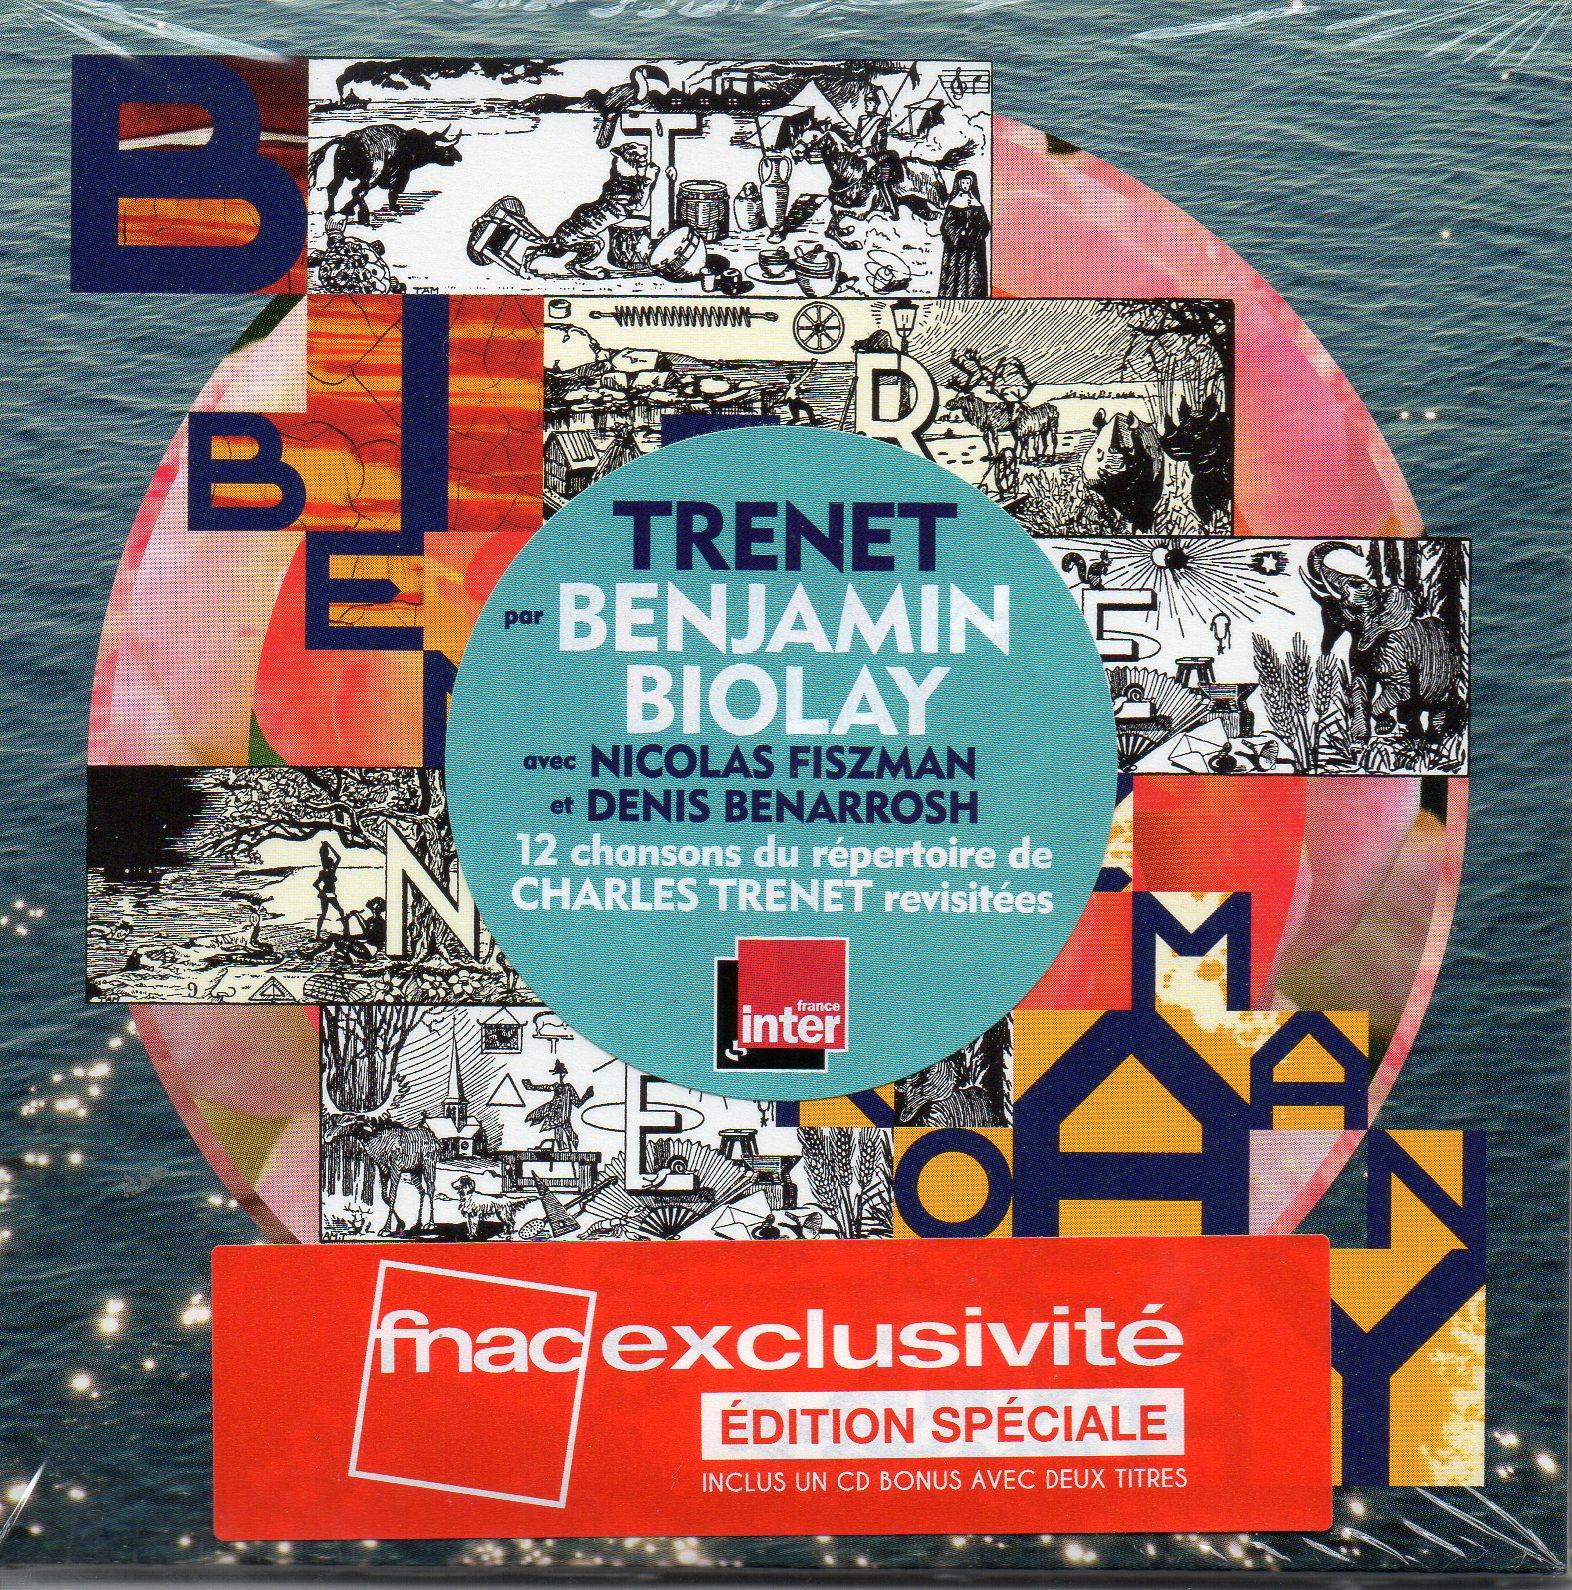 BENJAMIN BIOLAY - CHARLES TRENET - Trenet - Edition Spéciale 2 CD - CD x 2